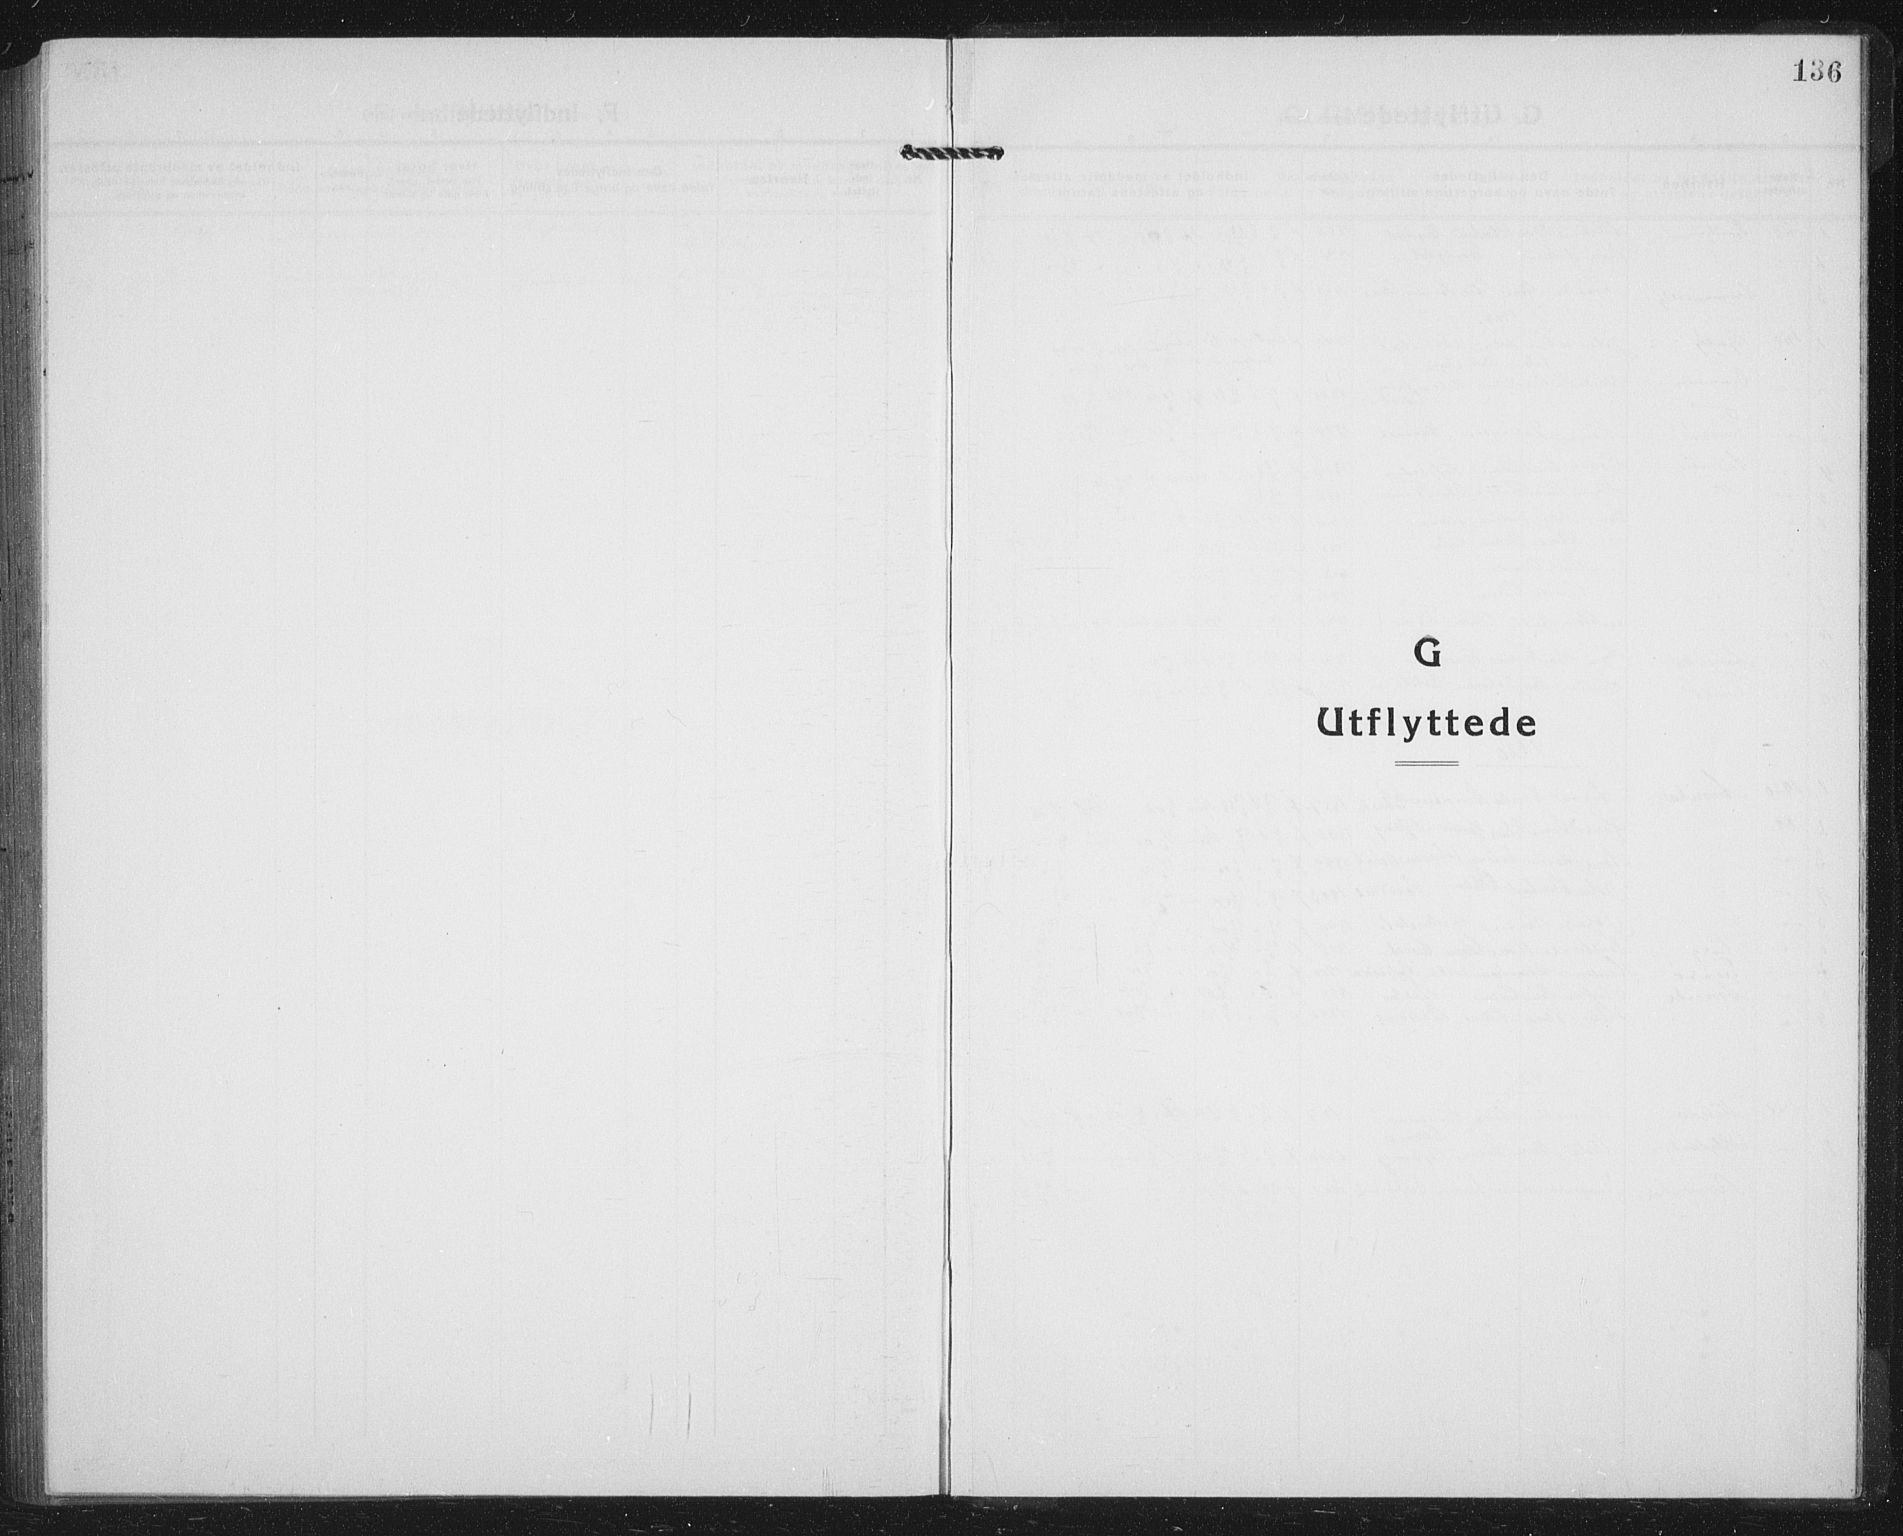 SATØ, Lenvik sokneprestembete, H/Ha/Hab/L0023klokker: Parish register (copy) no. 23, 1918-1936, p. 136